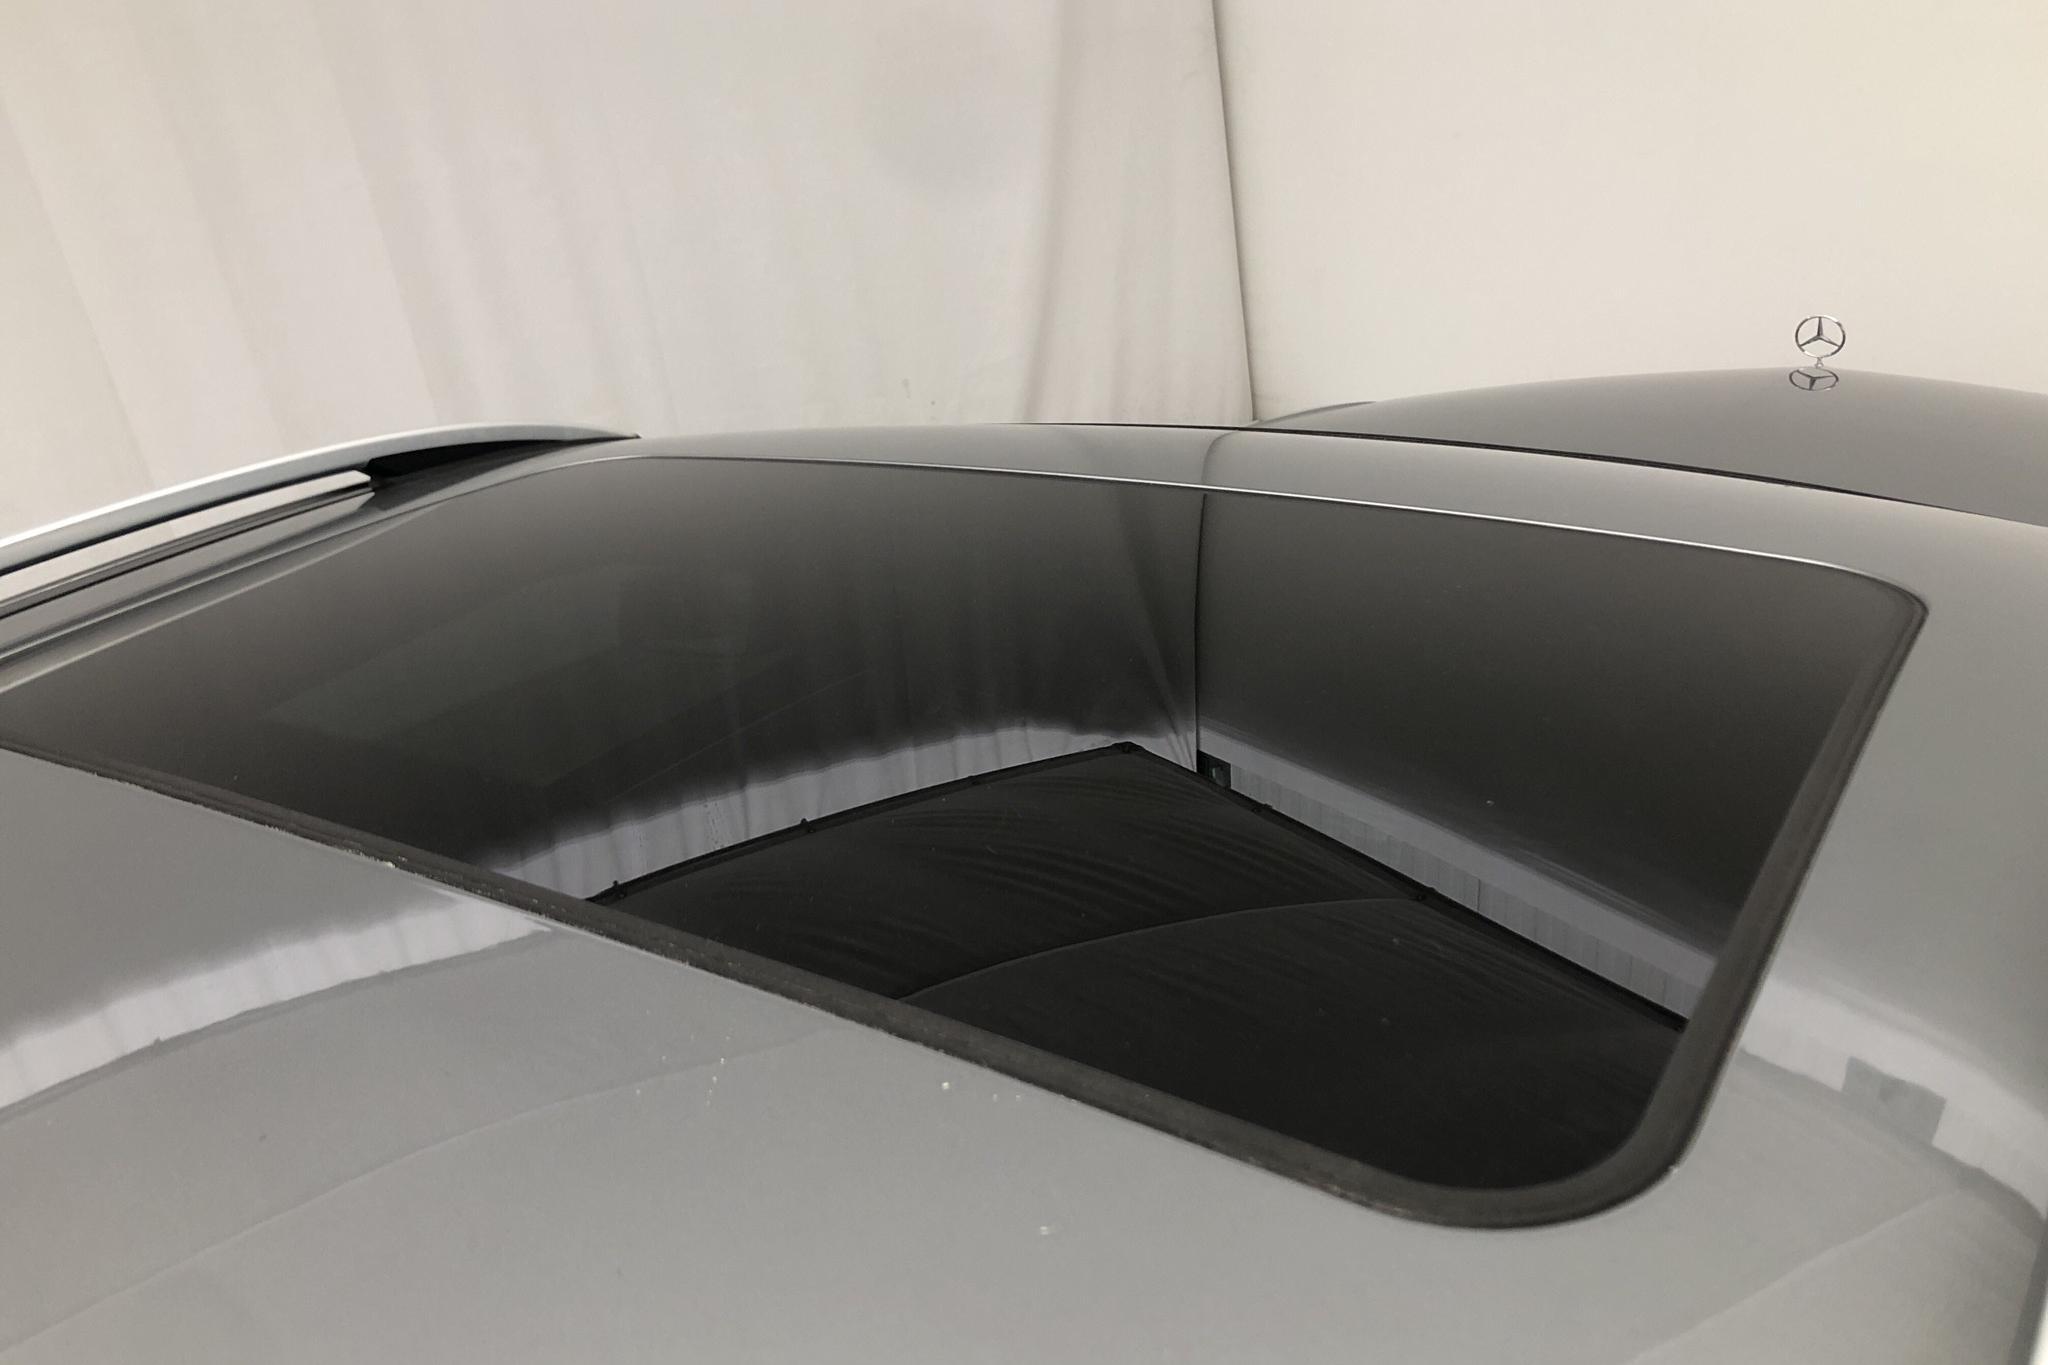 Mercedes E 350 CDI BlueEfficiency Kombi 4Matic S212 (231hk) - 15 841 mil - Automat - grå - 2010